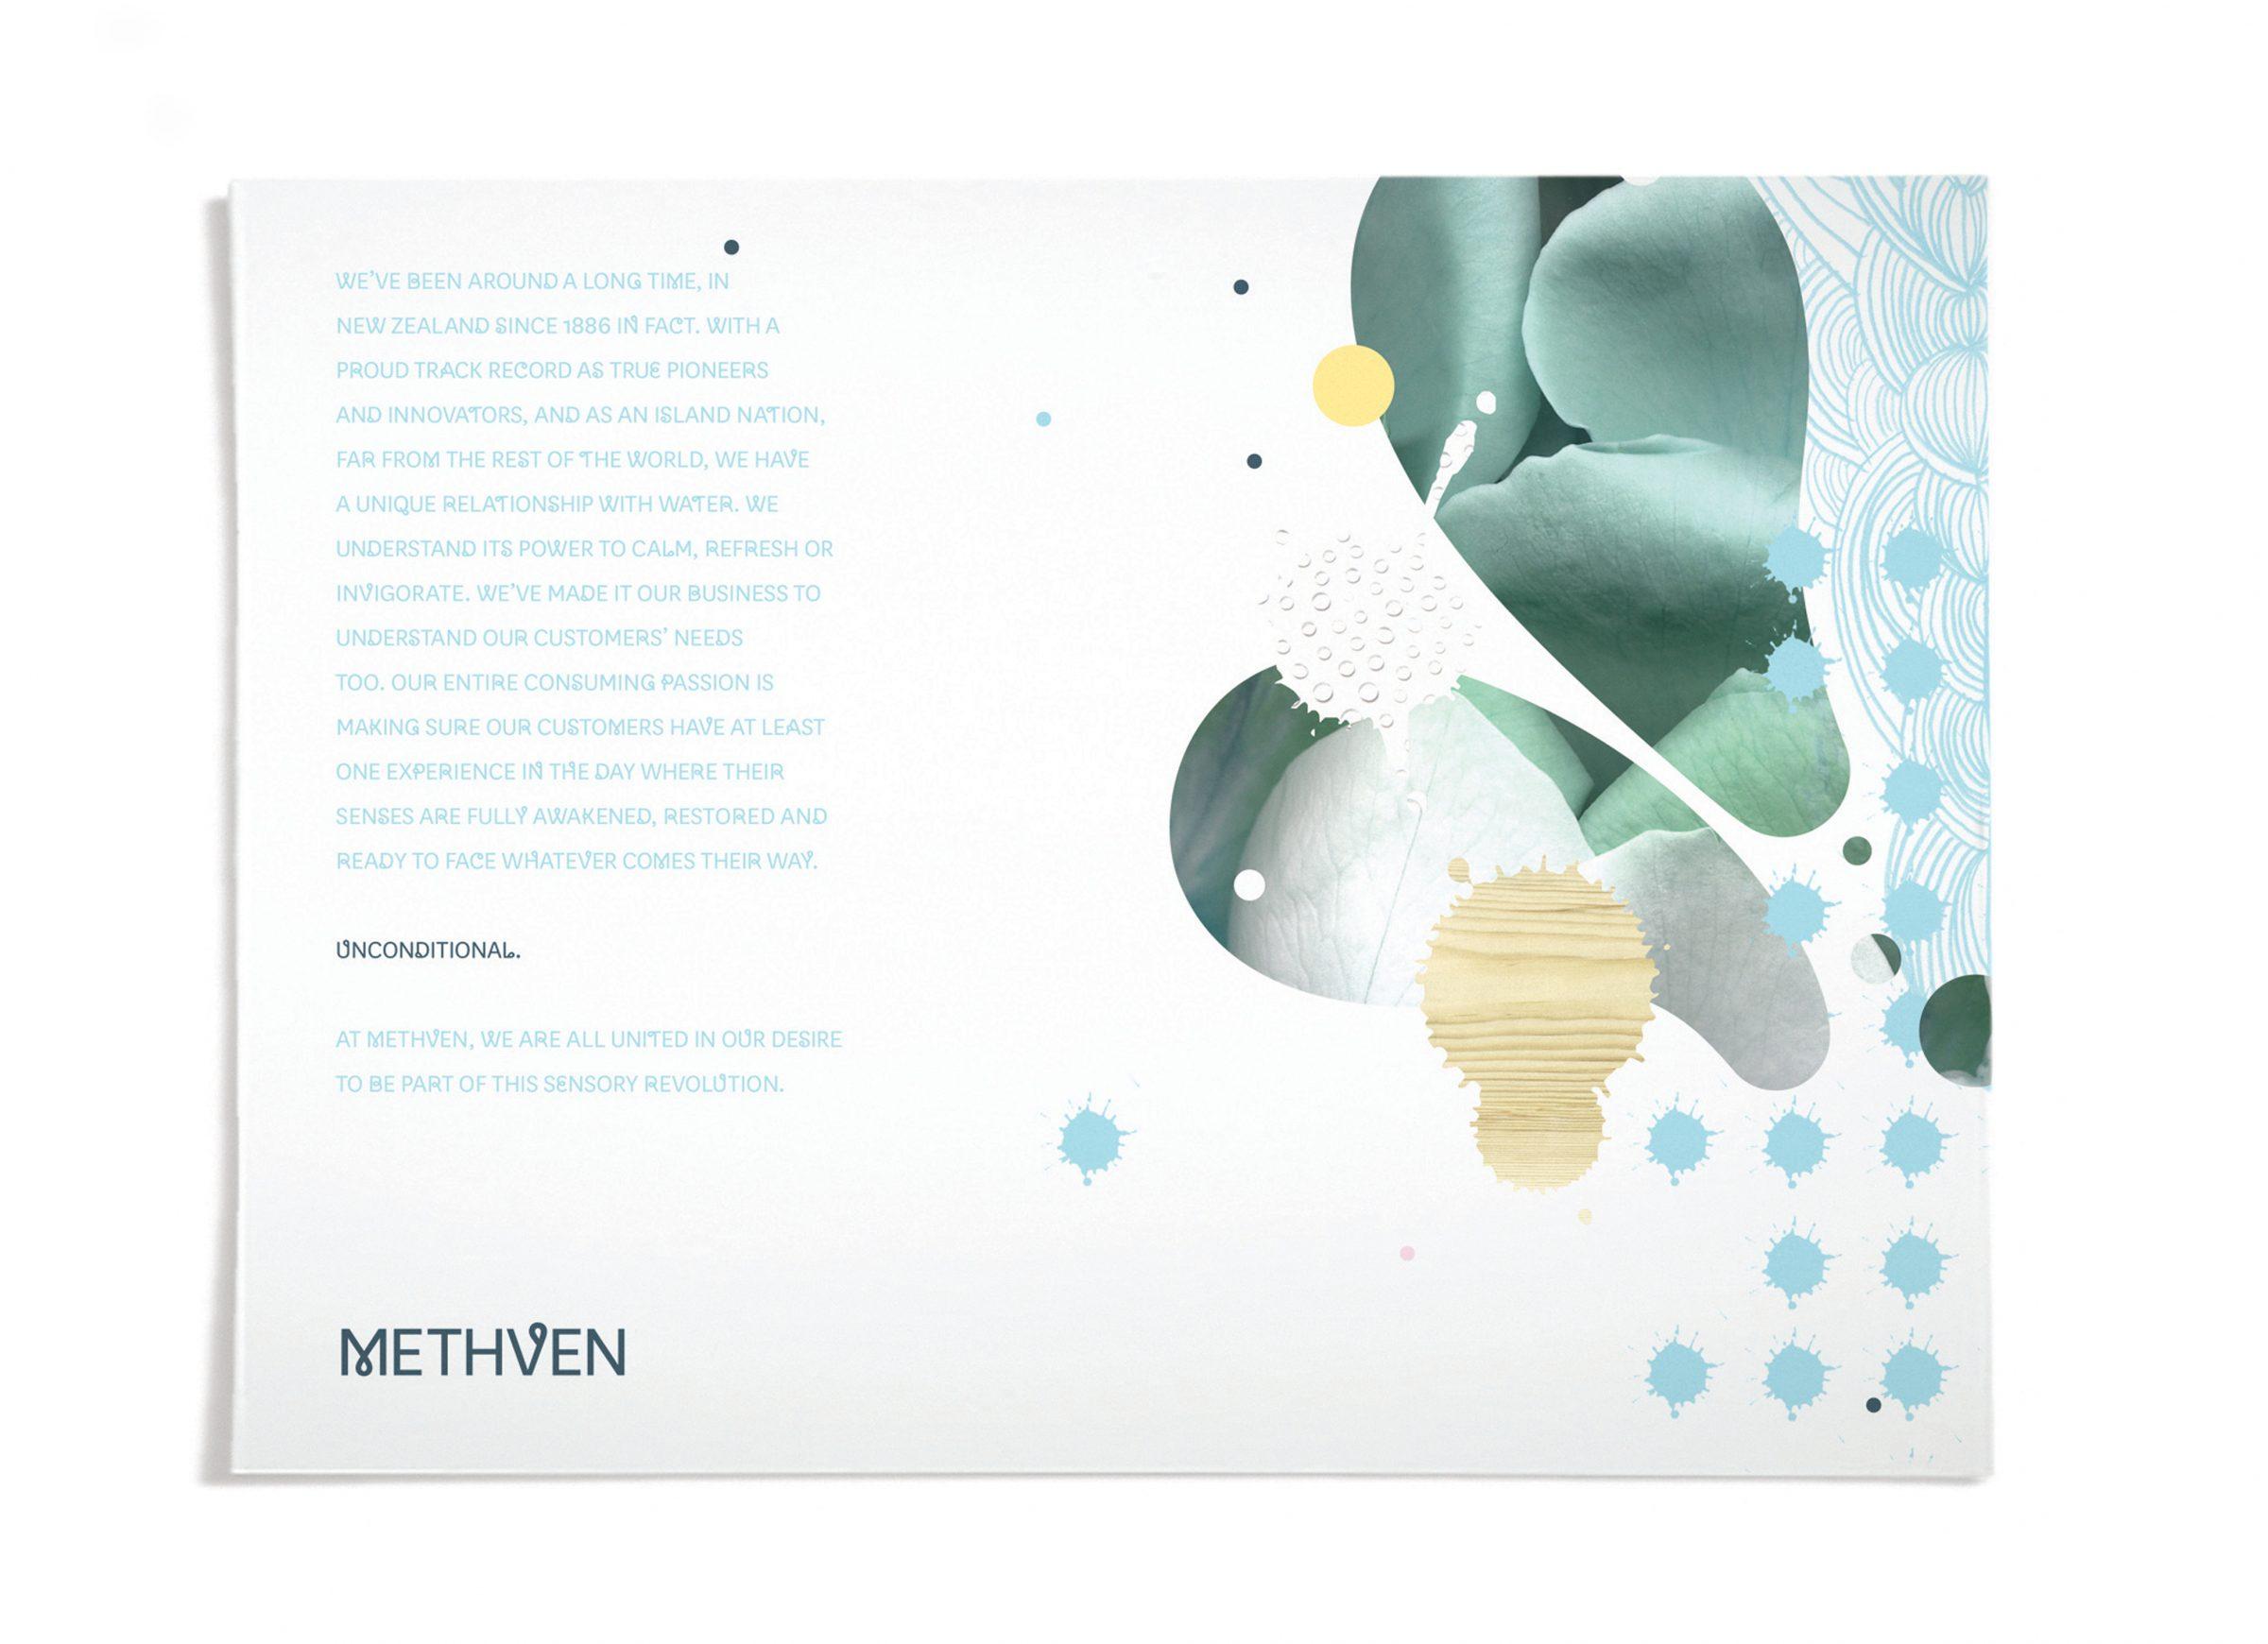 https://tanamitchell.com/wp-content/uploads/2018/10/Methven-2000x1450px7-2400x1740.jpg